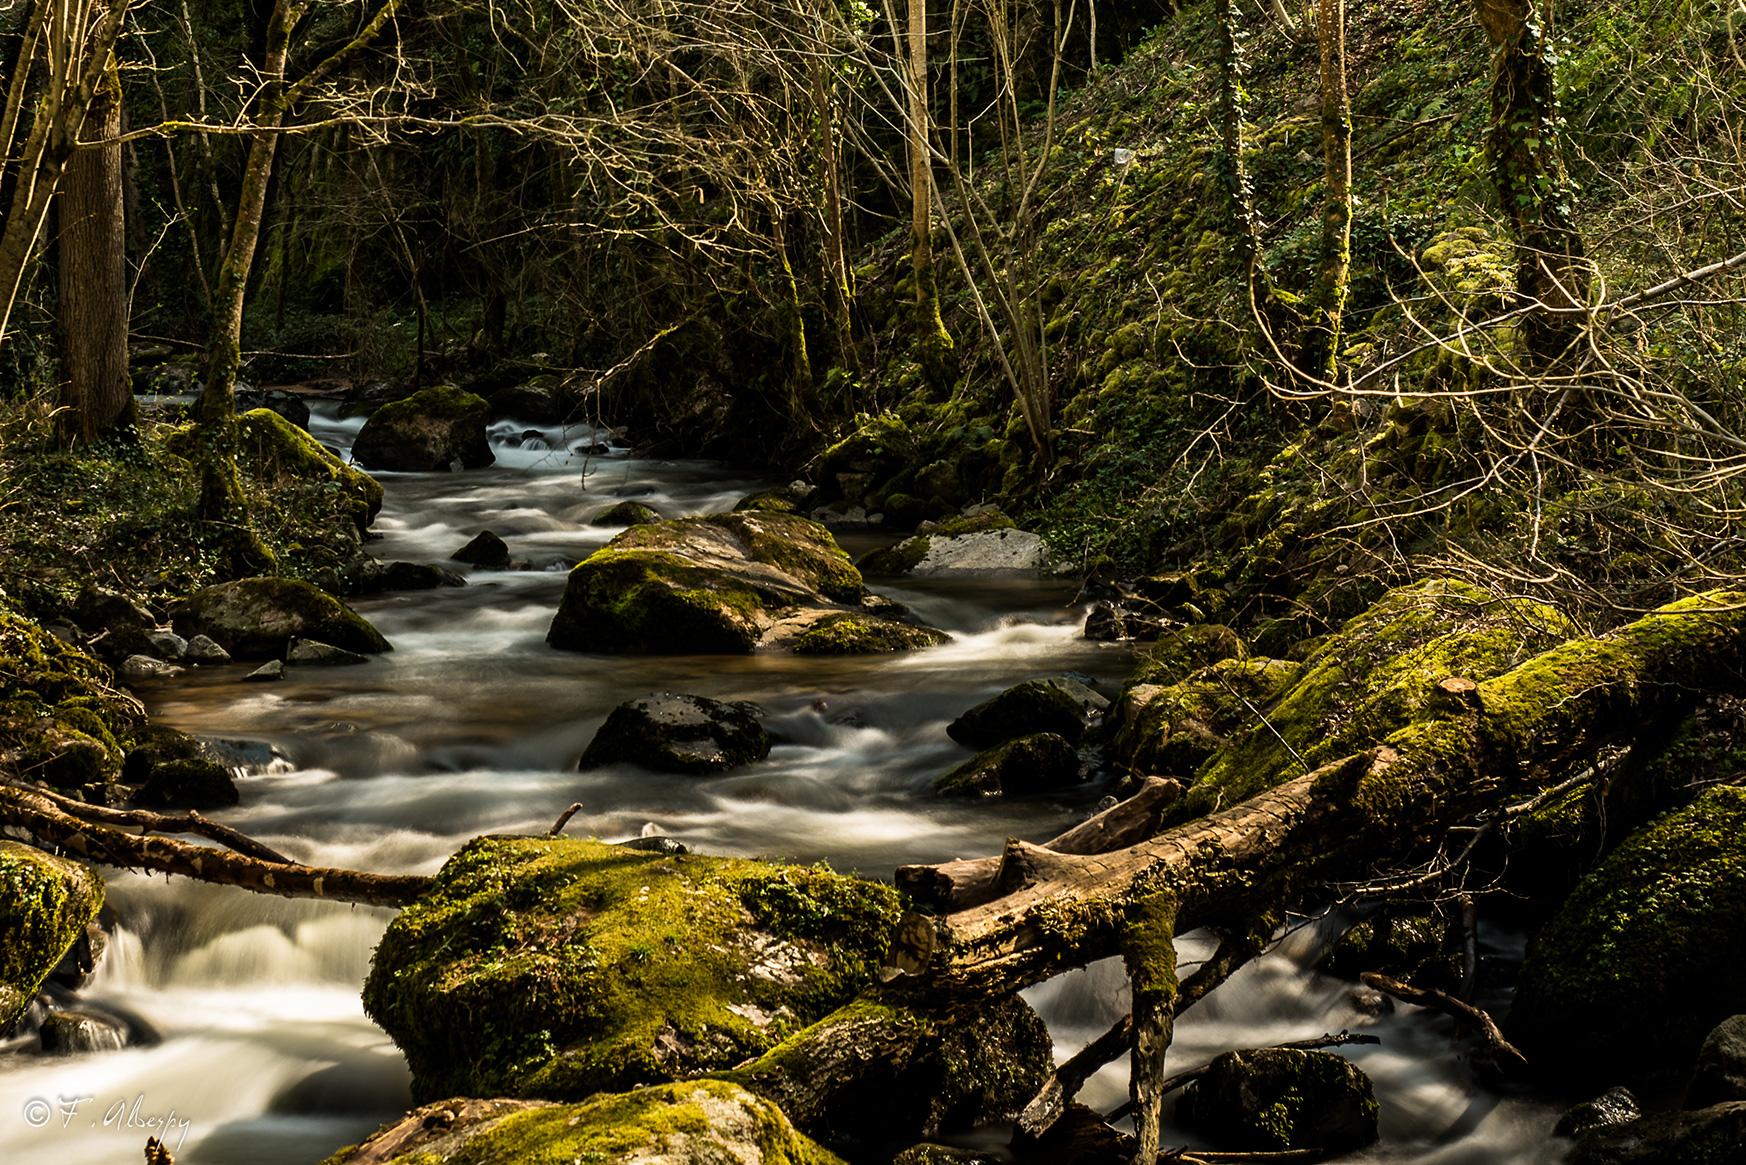 Ruisseau, Peyrusse-le-Roc © F. Albespy